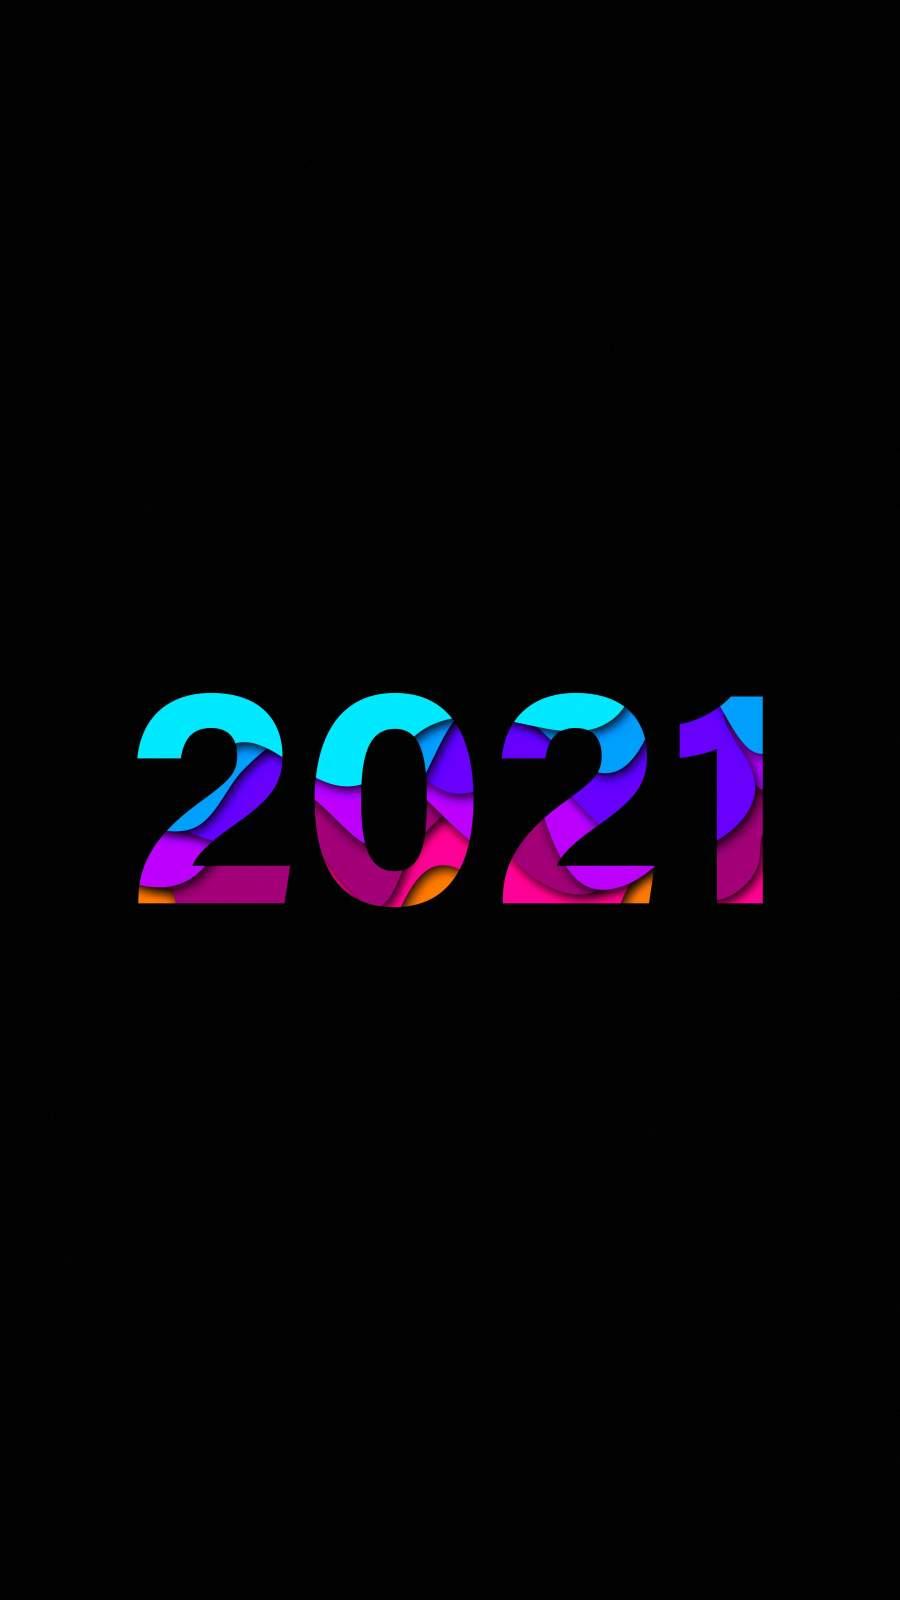 2021 Wallpaper